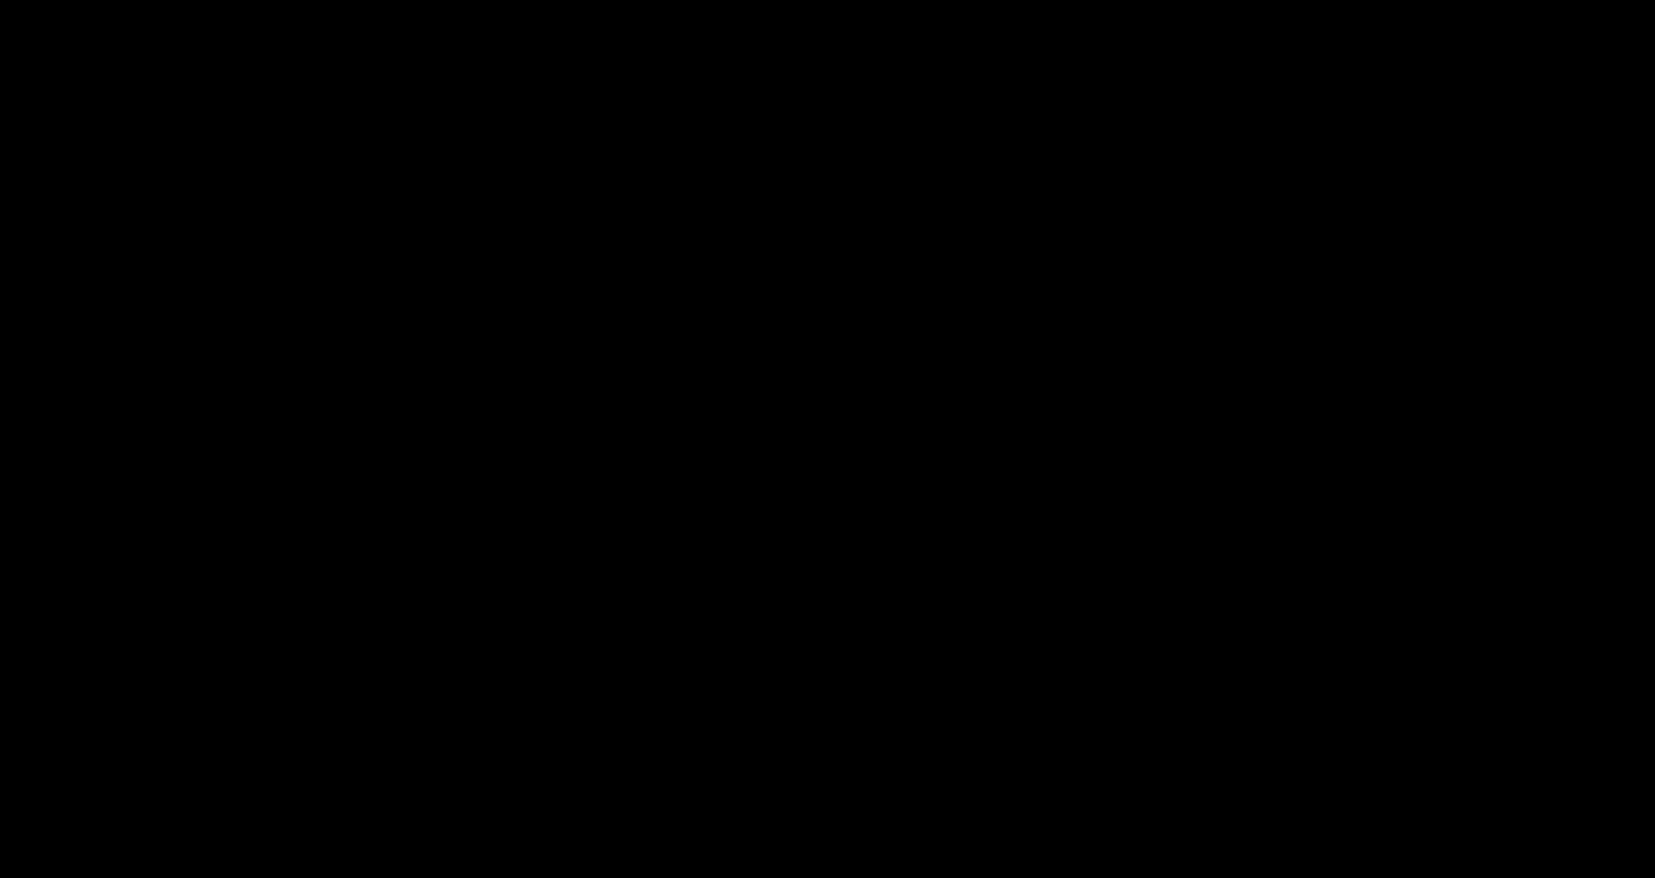 Screenshot 17-05-2021 22.48.42